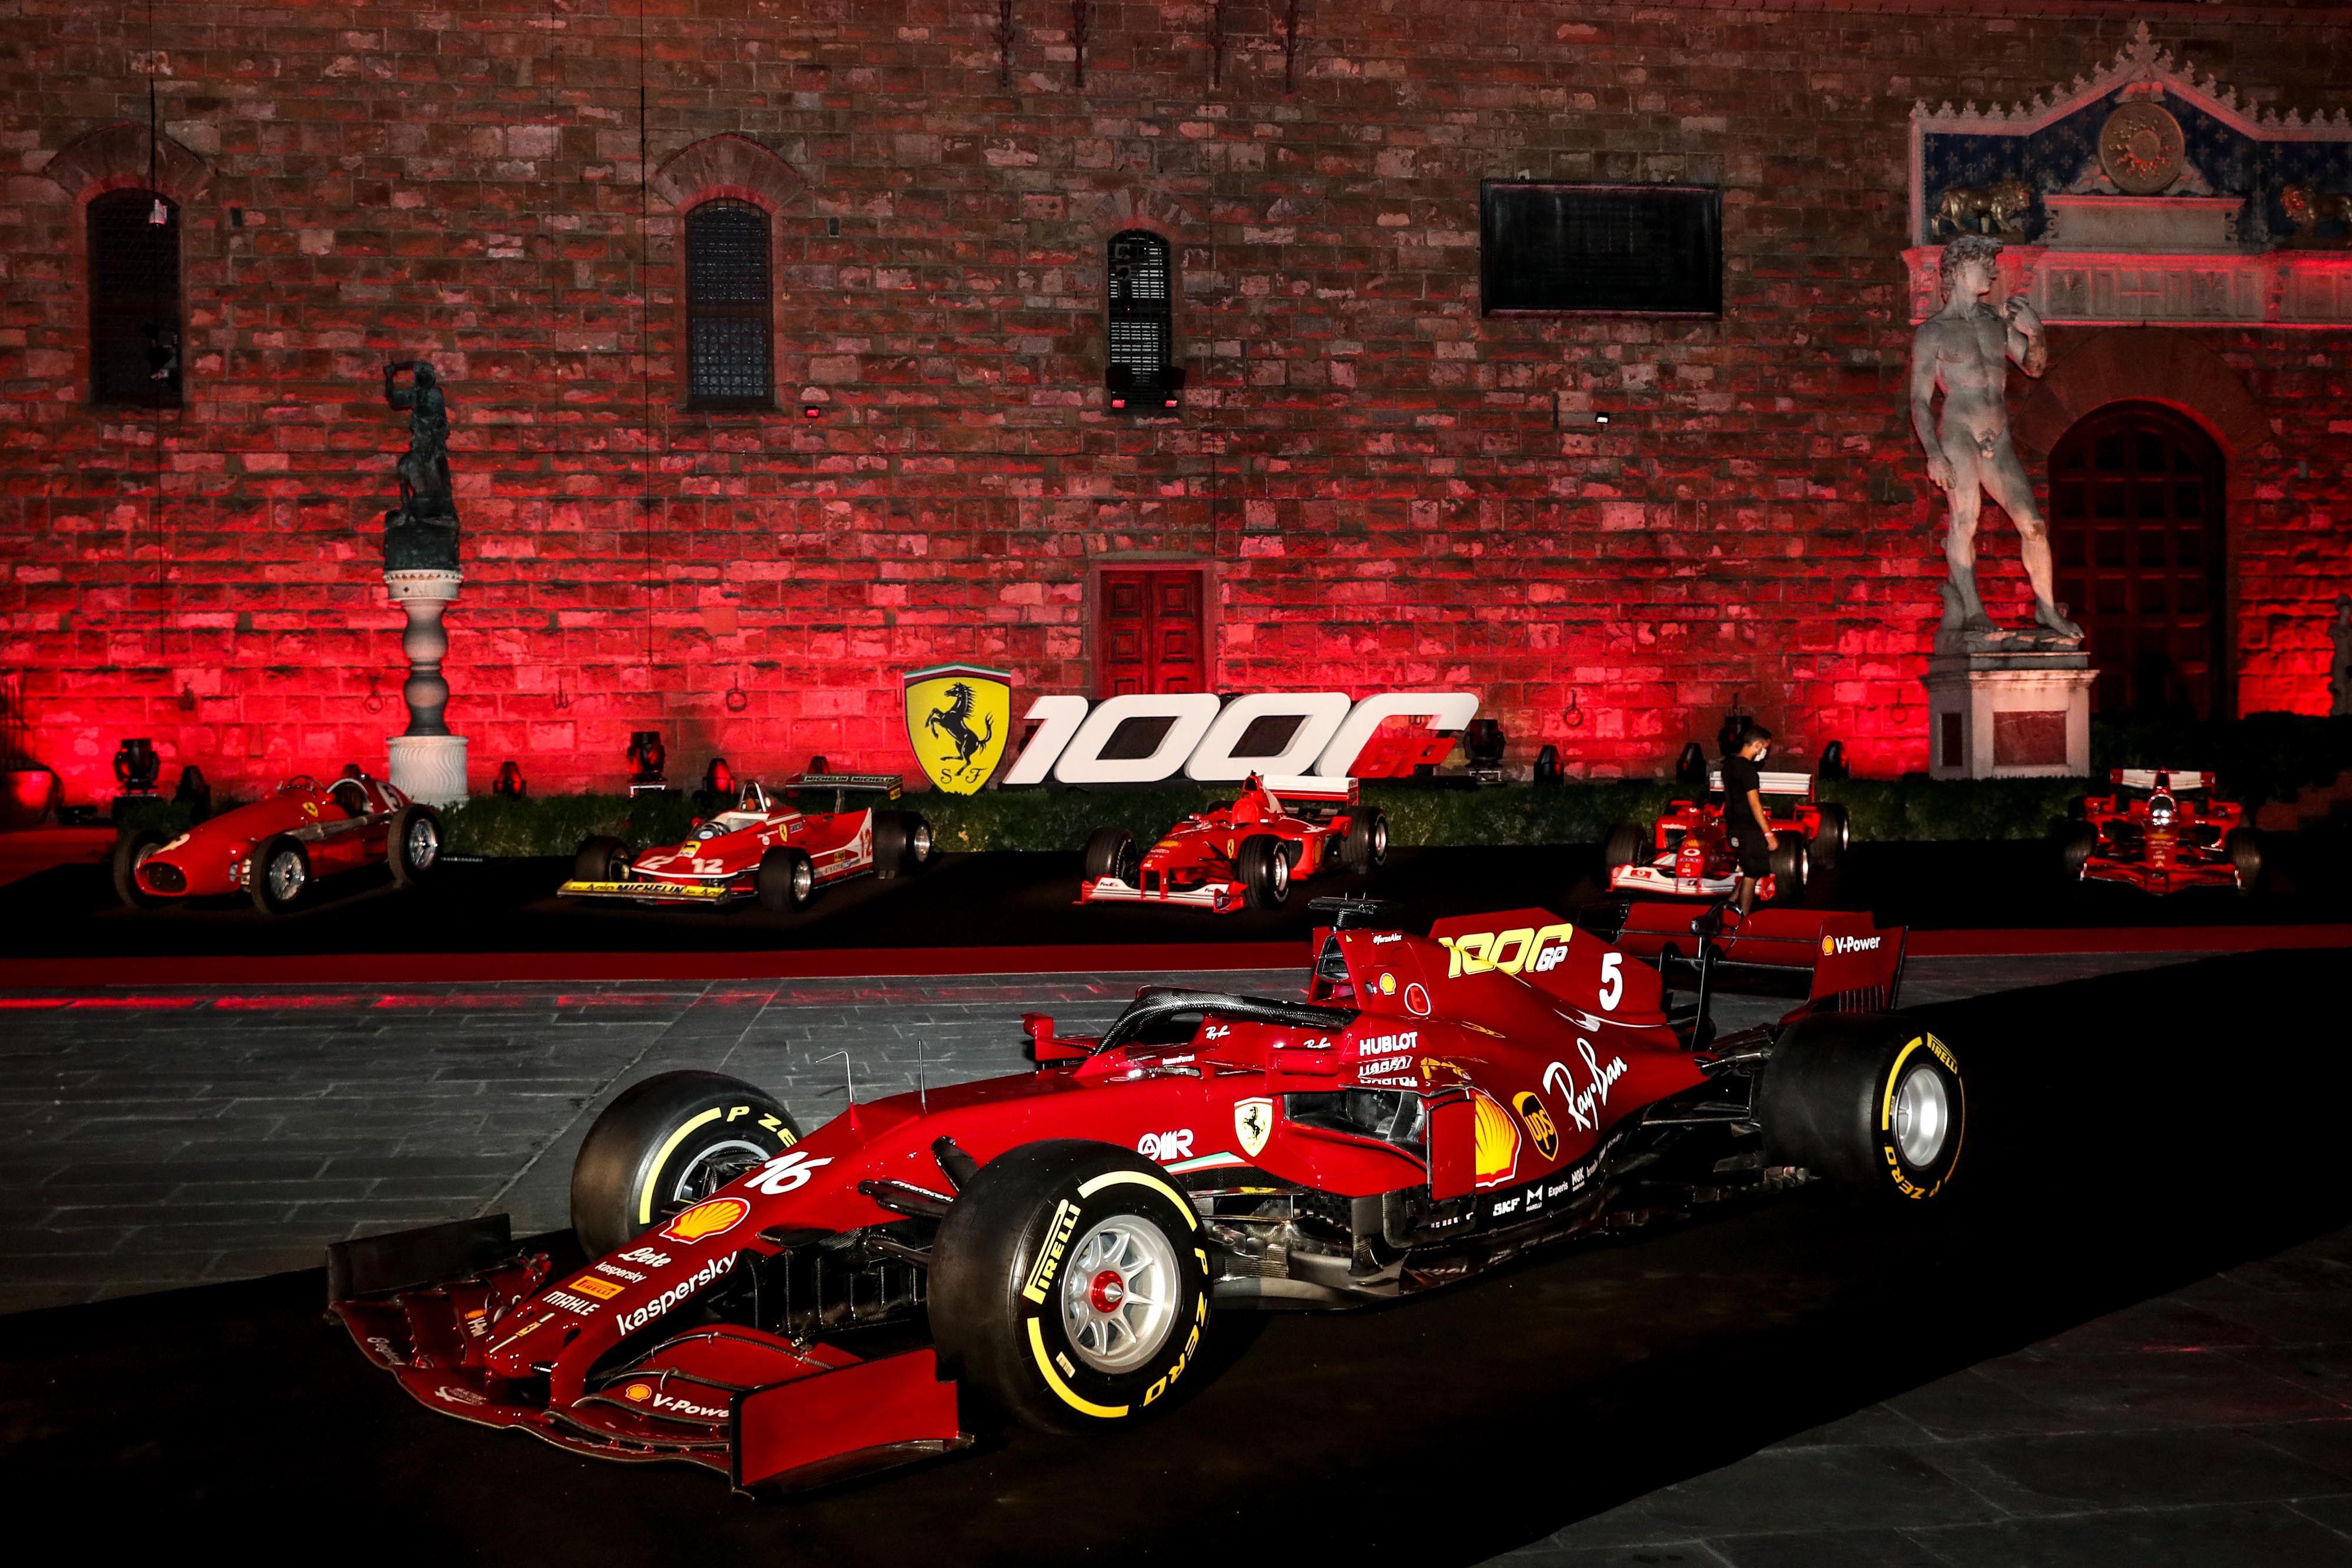 2018 Ferrari Sf71h F1 Formula 1 4k 3 Wallpaper Hd Car Wallpapers Id 9648